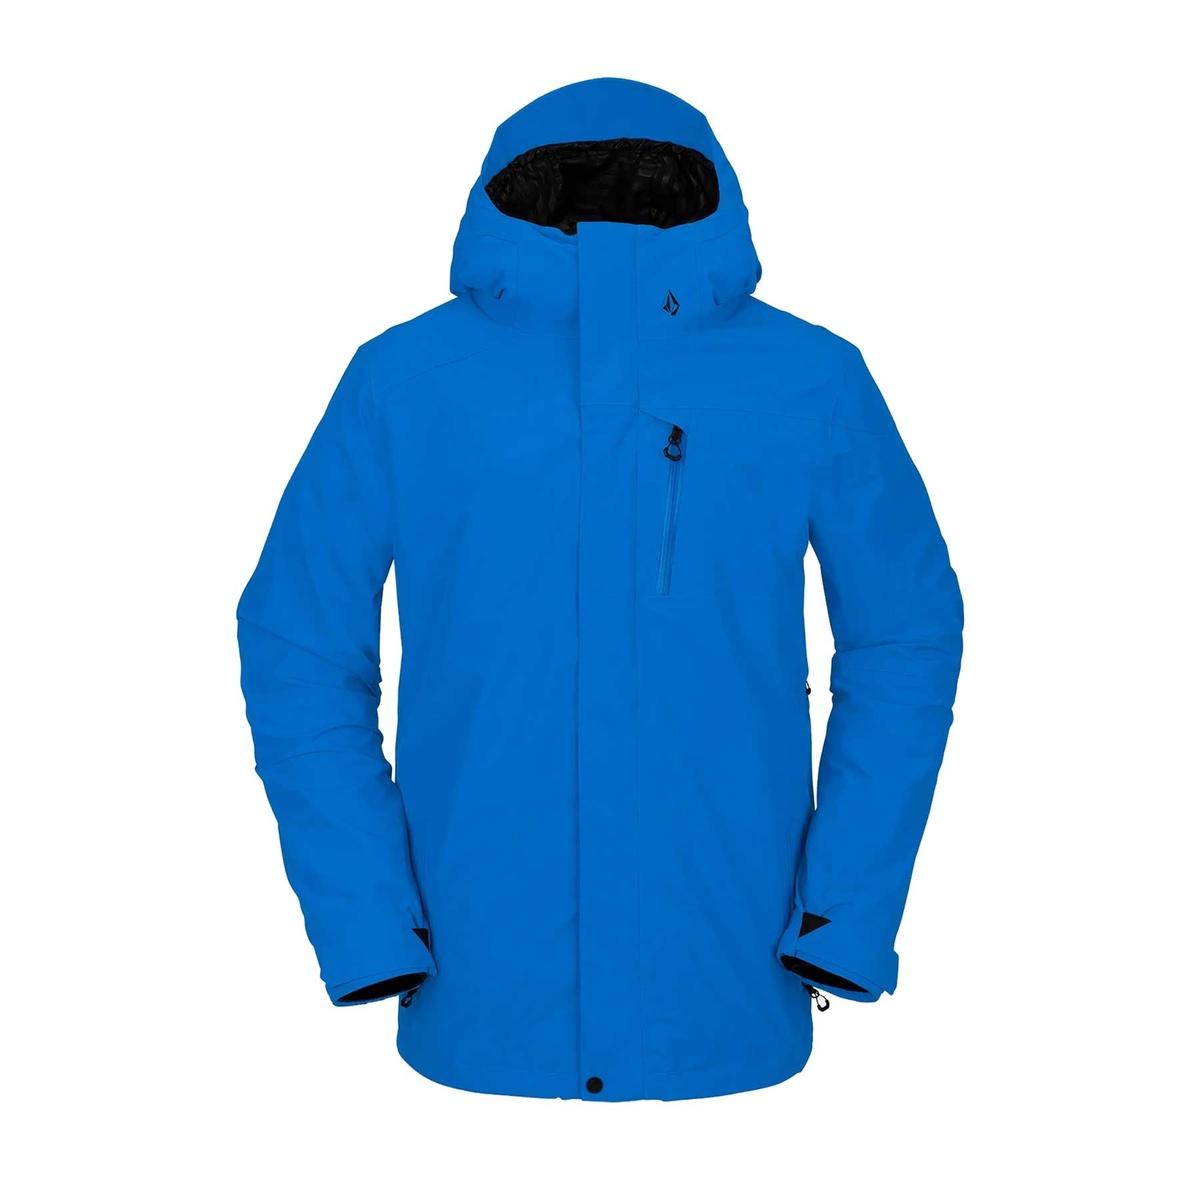 Prezzi Volcom giacca l insulated gore-tex